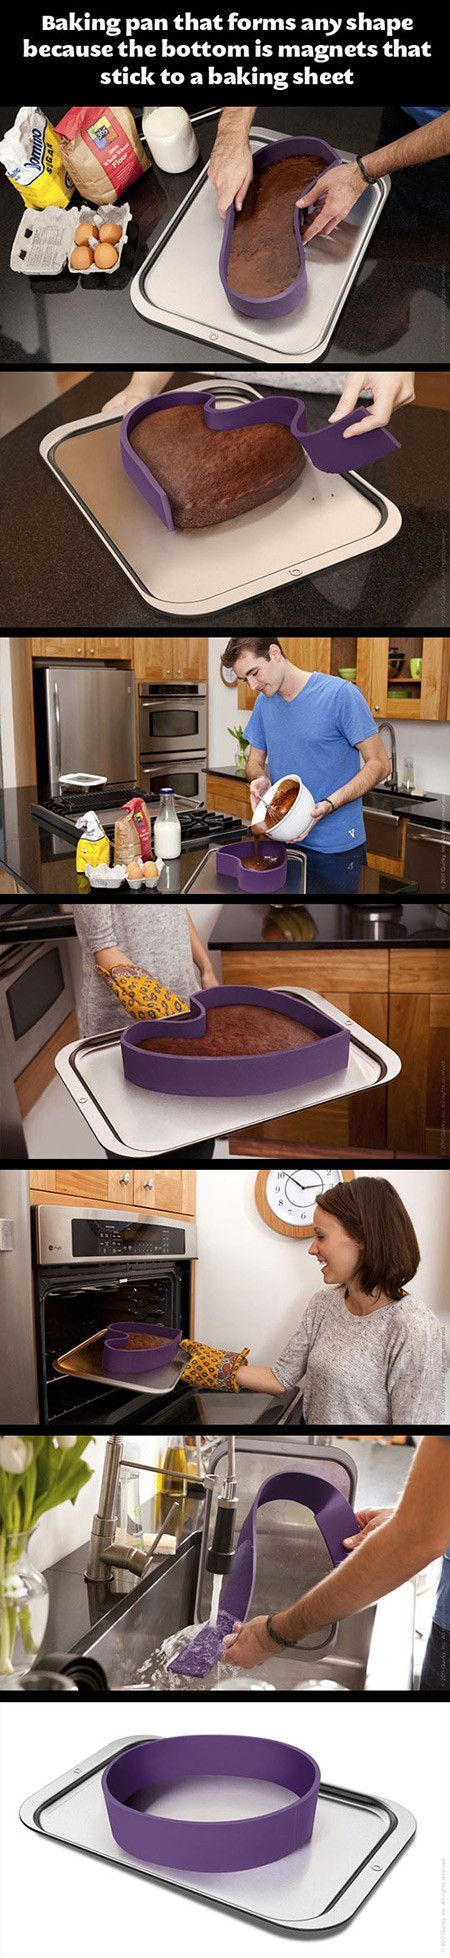 Cooler Geeks - Cool Home Gadget That Every Geek Needs in the Kitchen - TechEBlog #geeky #coolthingstobuy #thatseasier